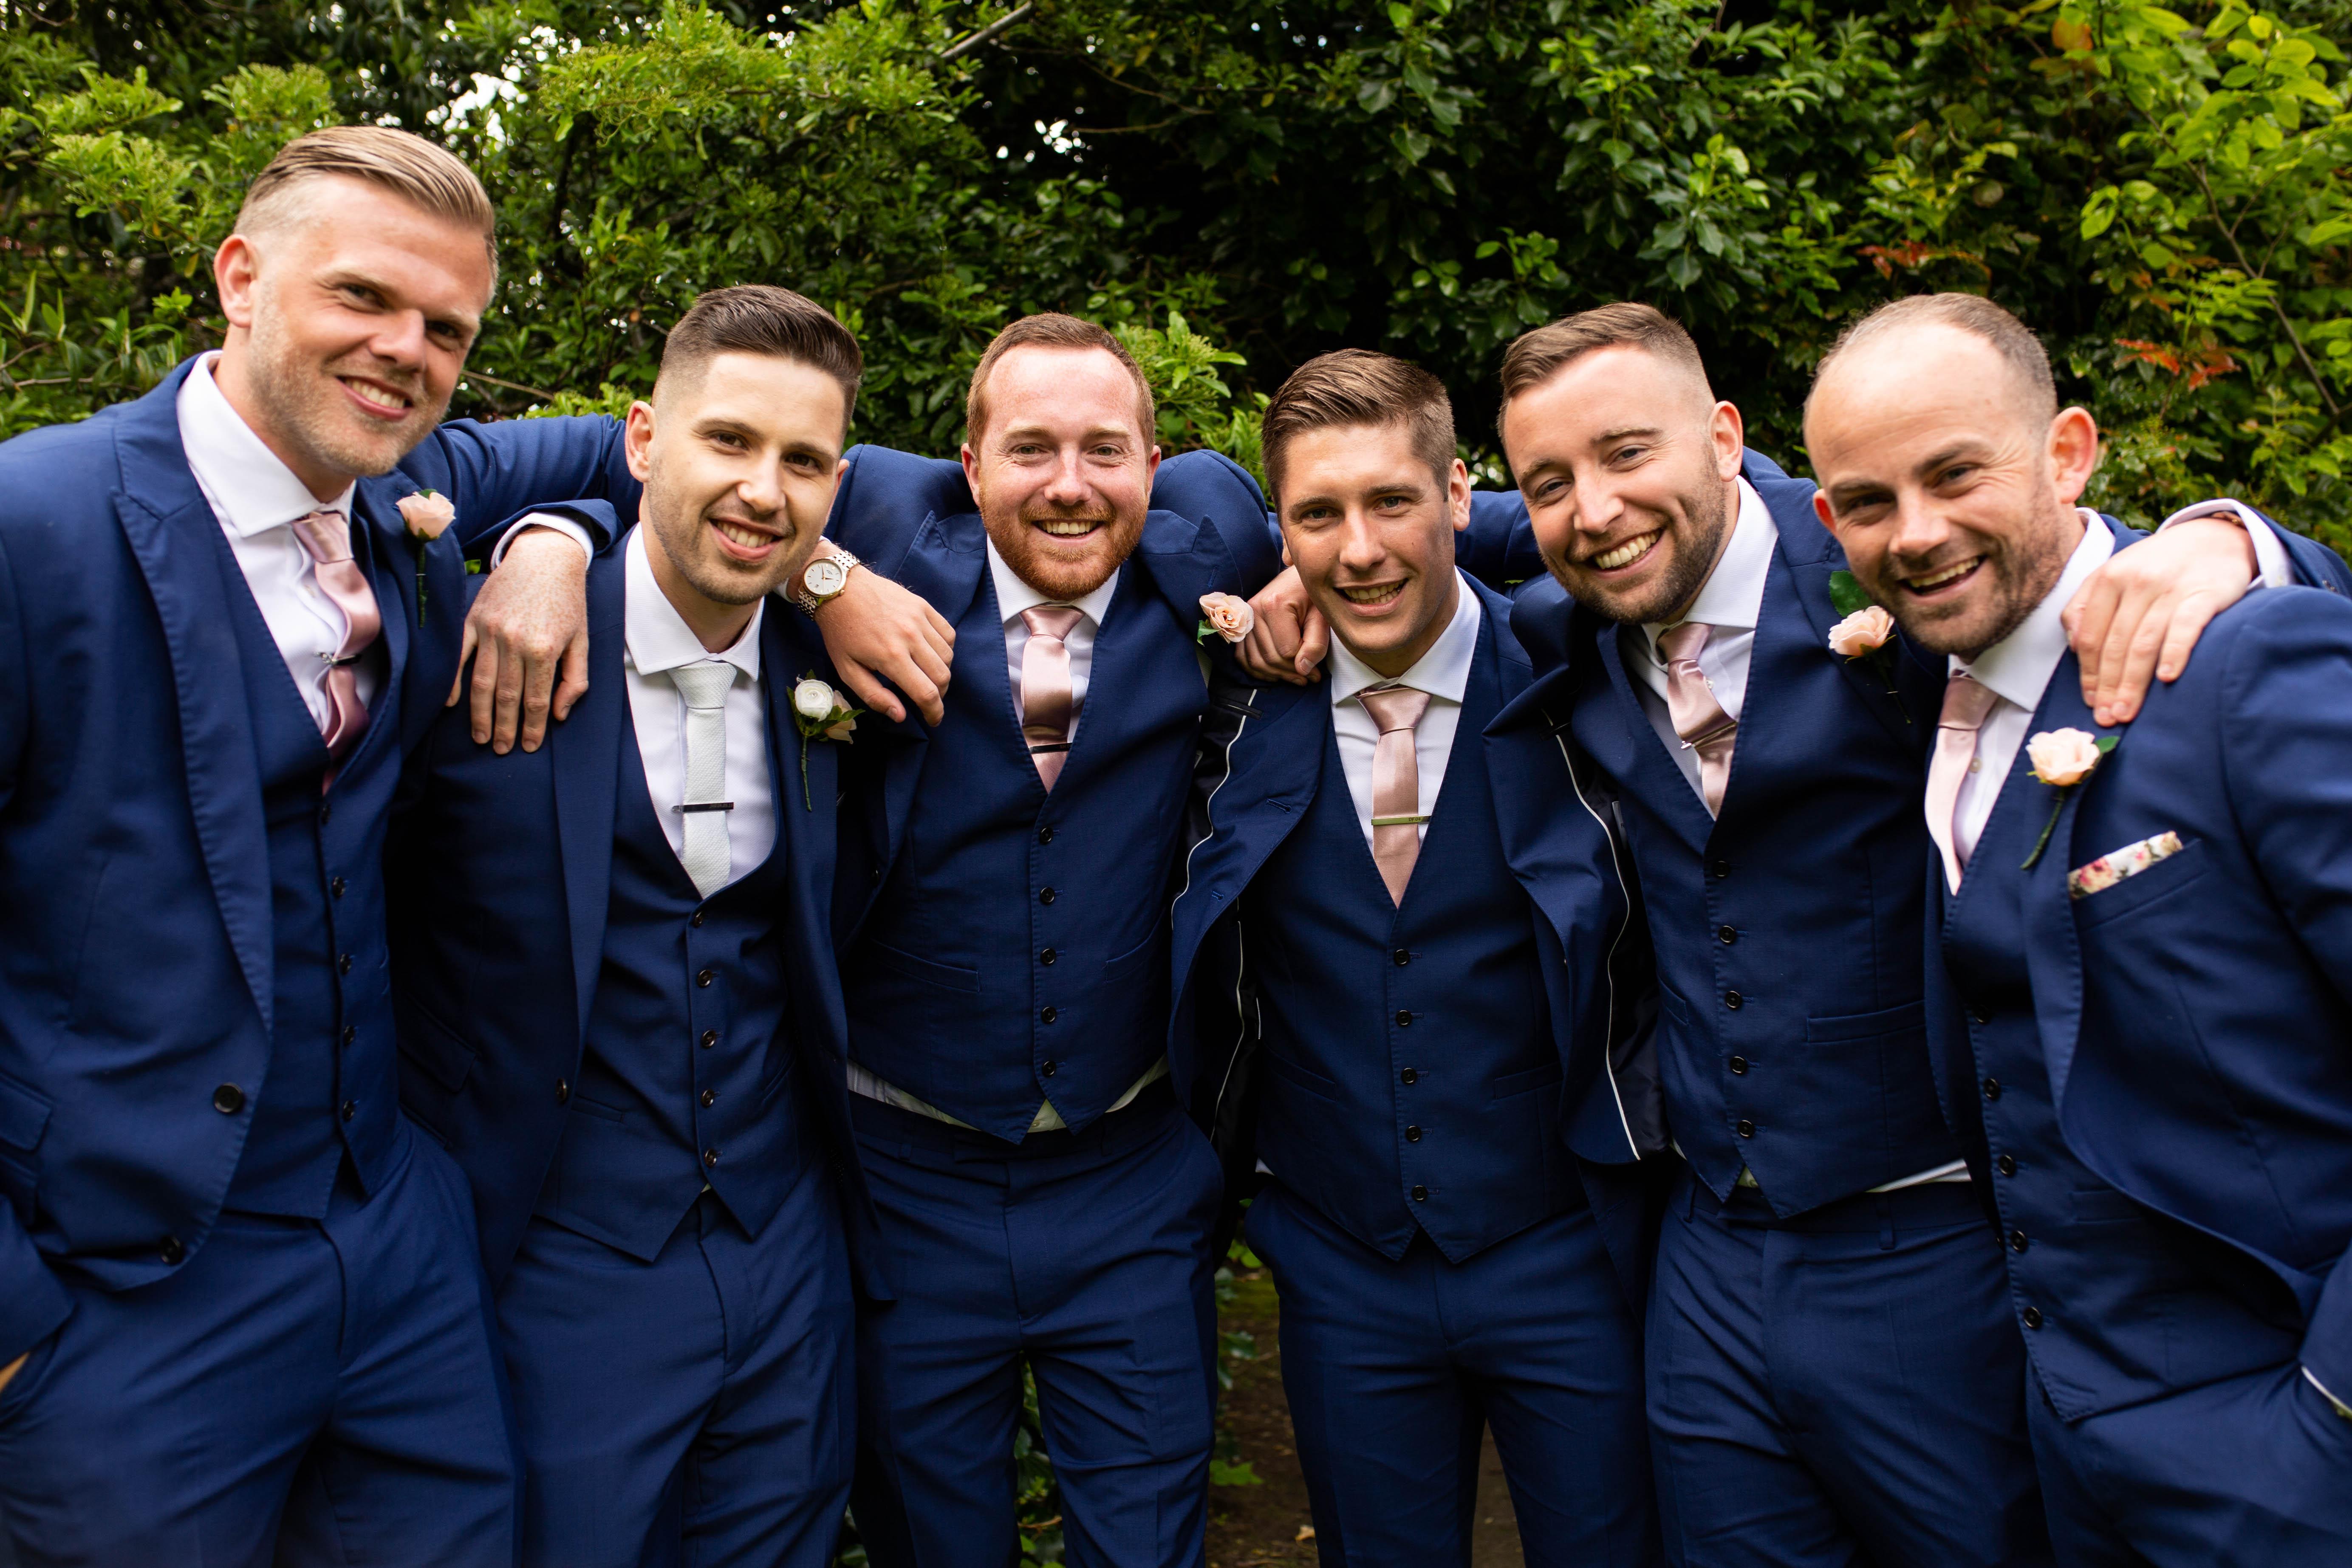 Alderley Edge Hotel Wedding